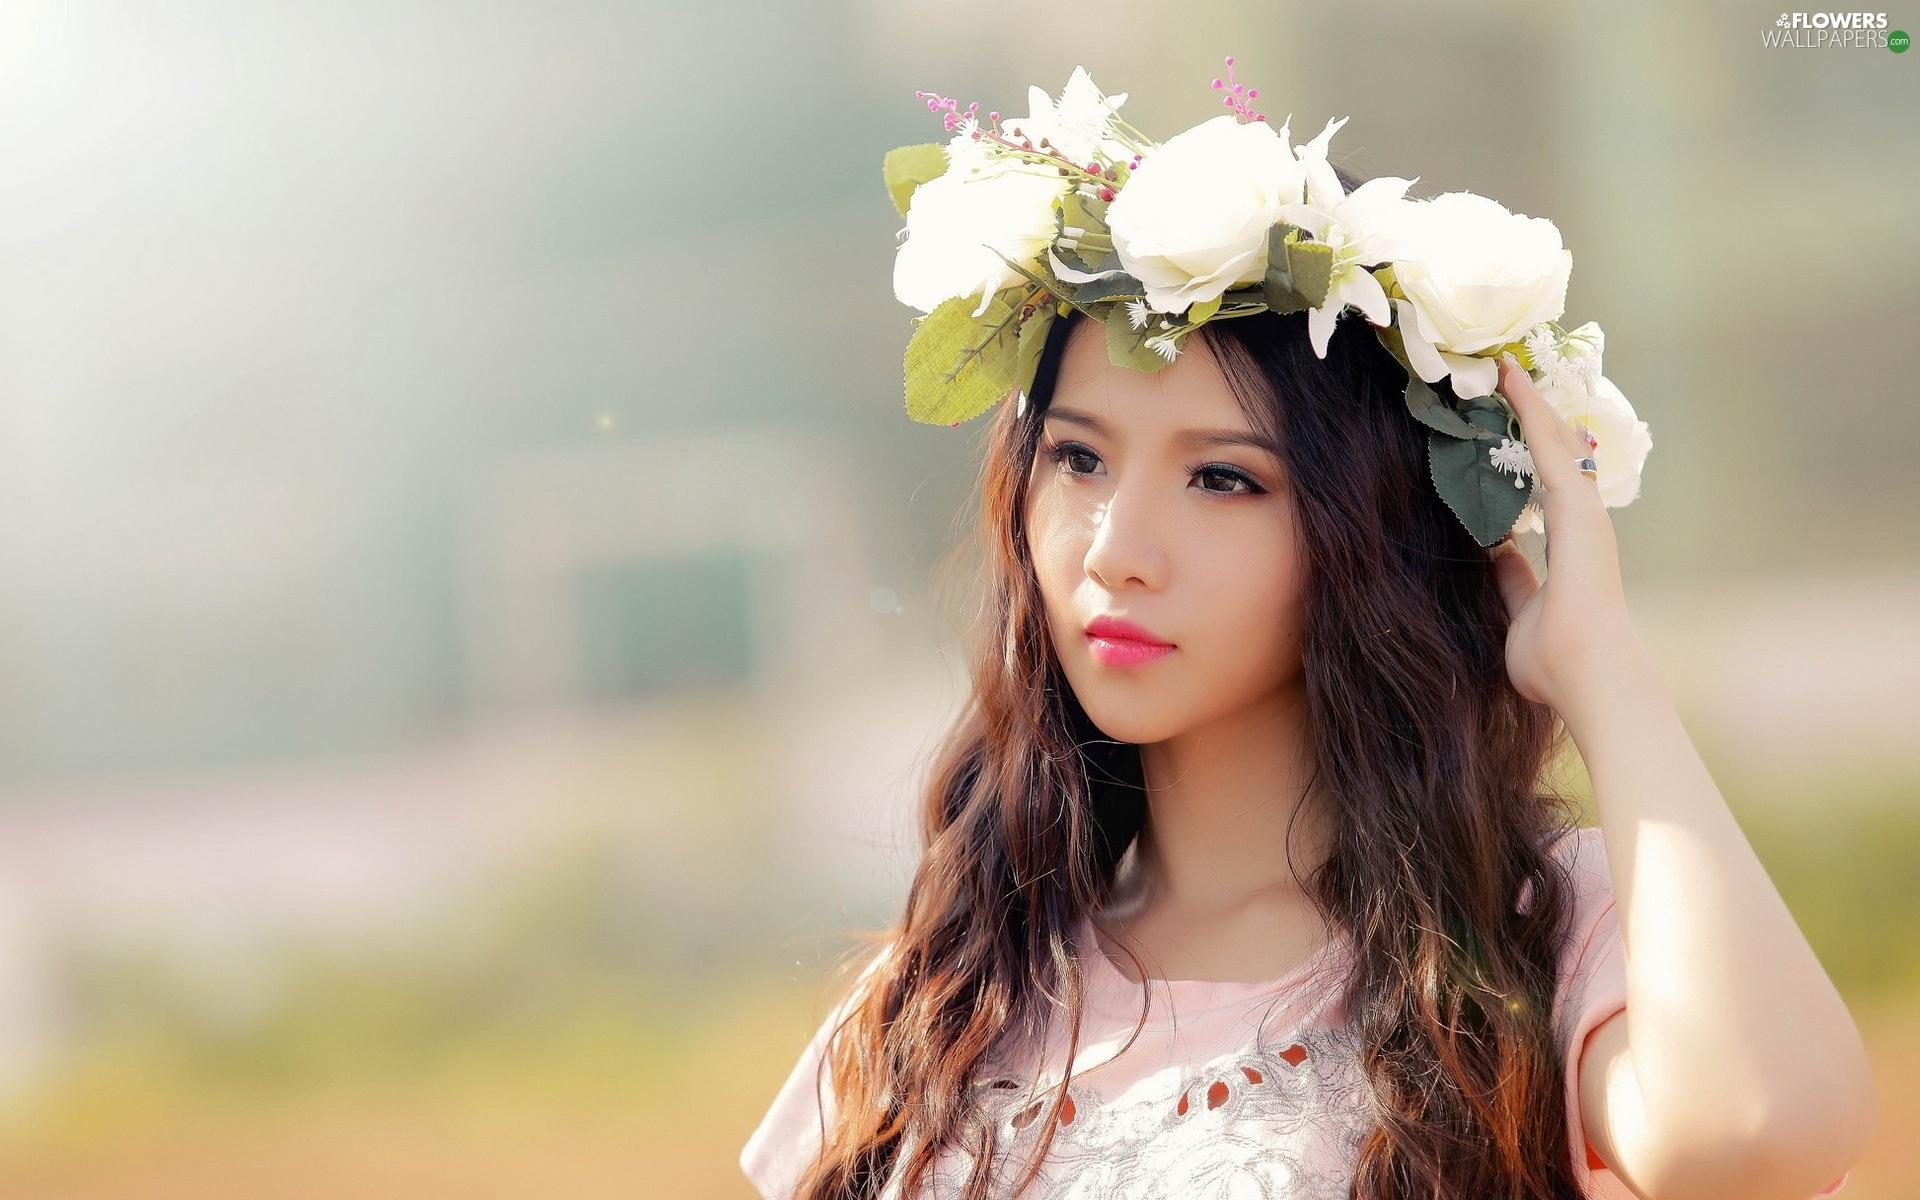 Beautiful Girl Wallpaper For Mobile Make Up Beauty Dbz Rouge Wreath Japanese Girl